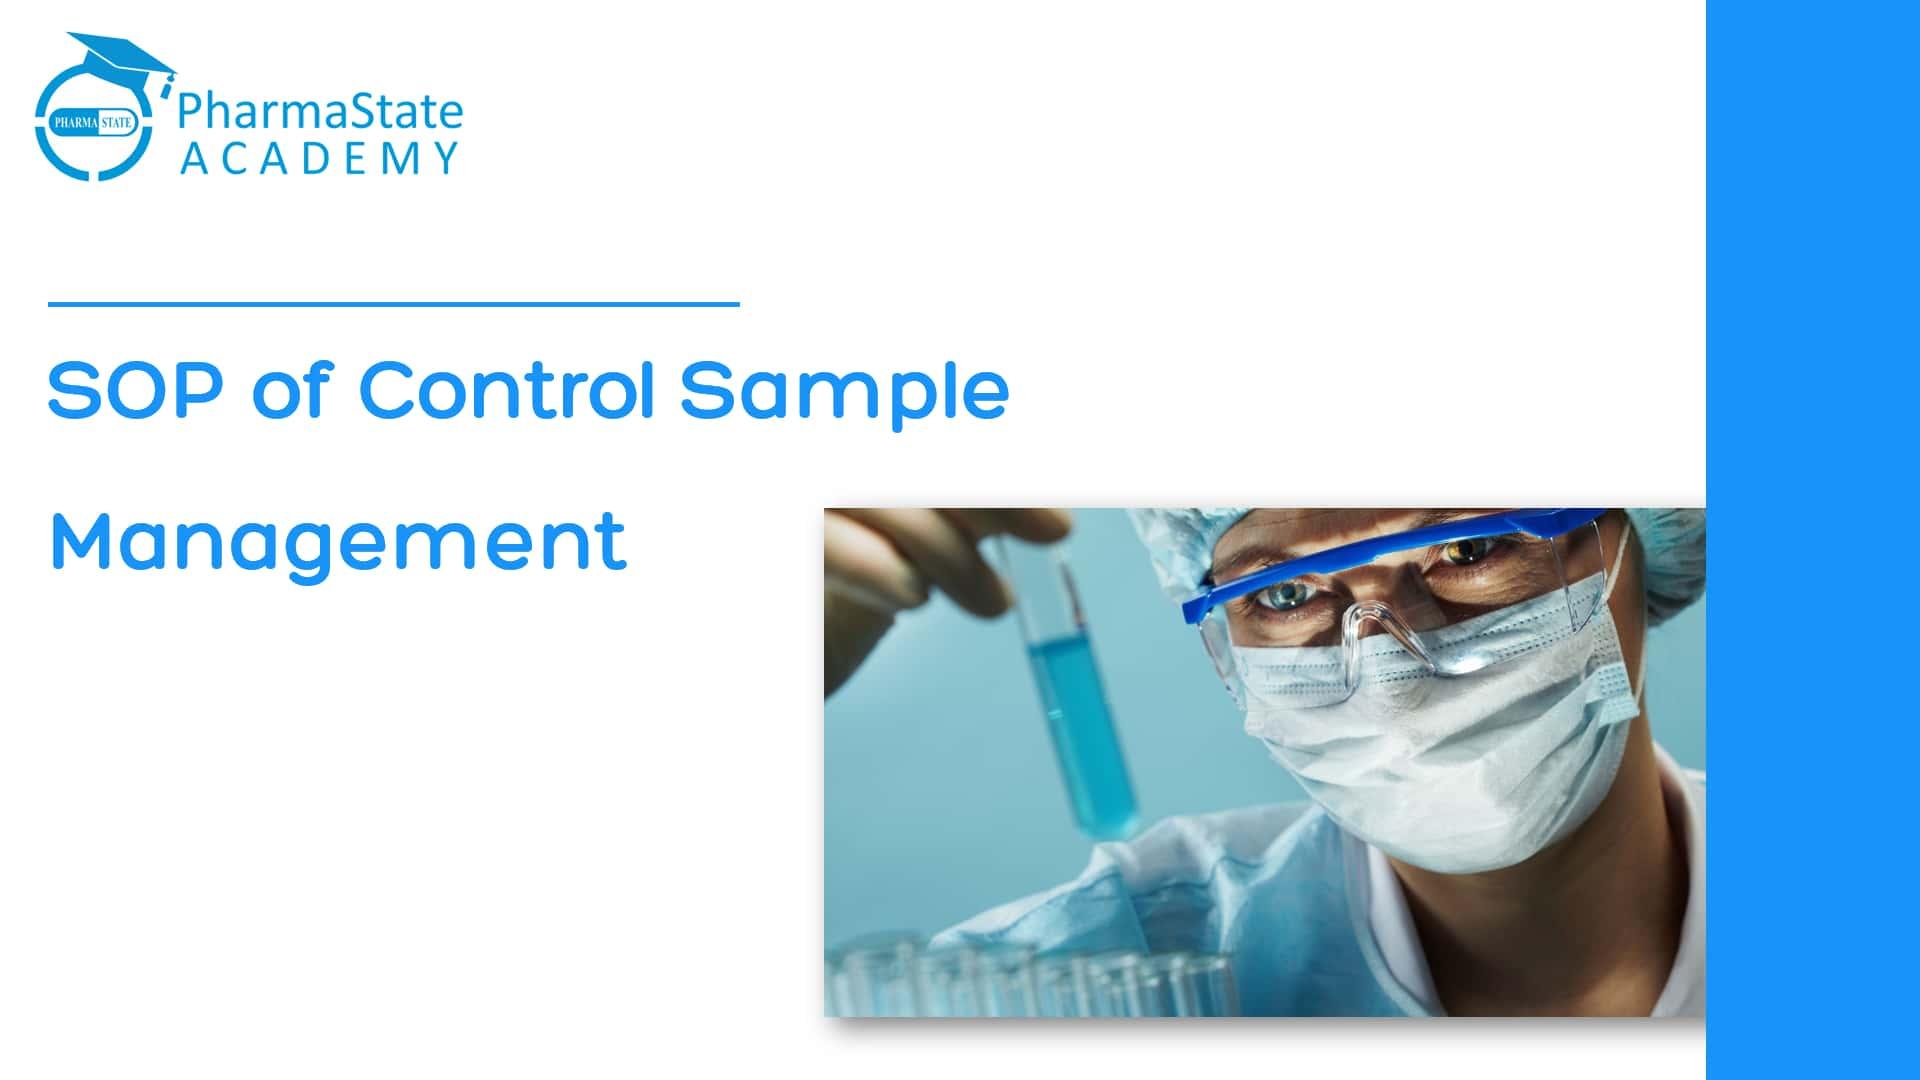 handling of Control Sample